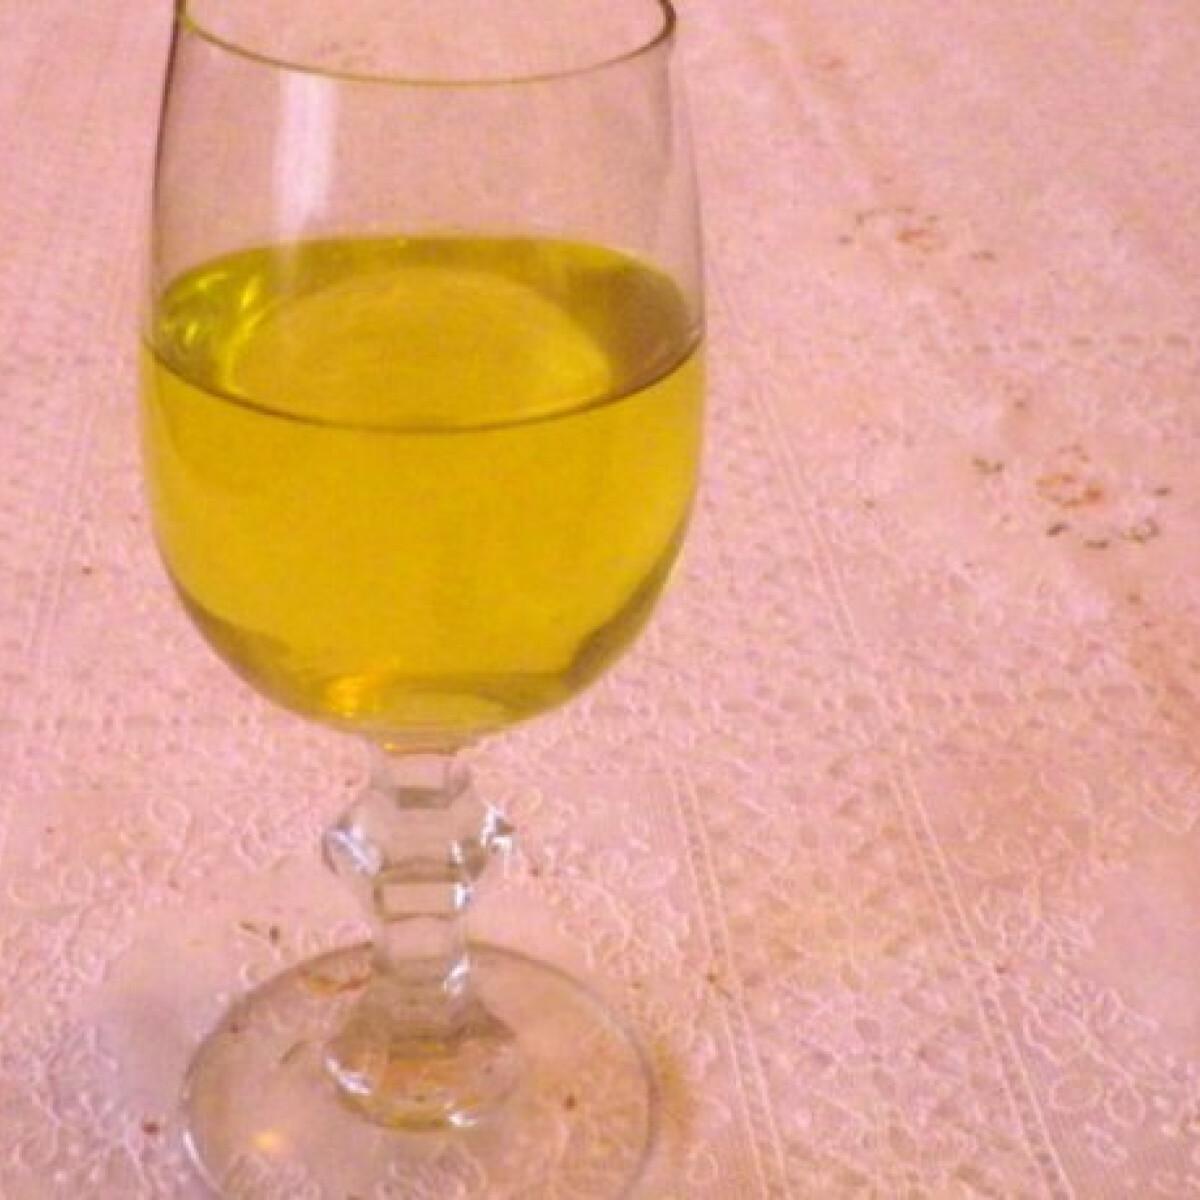 Ezen a képen: Limoncello likőr lime-mal